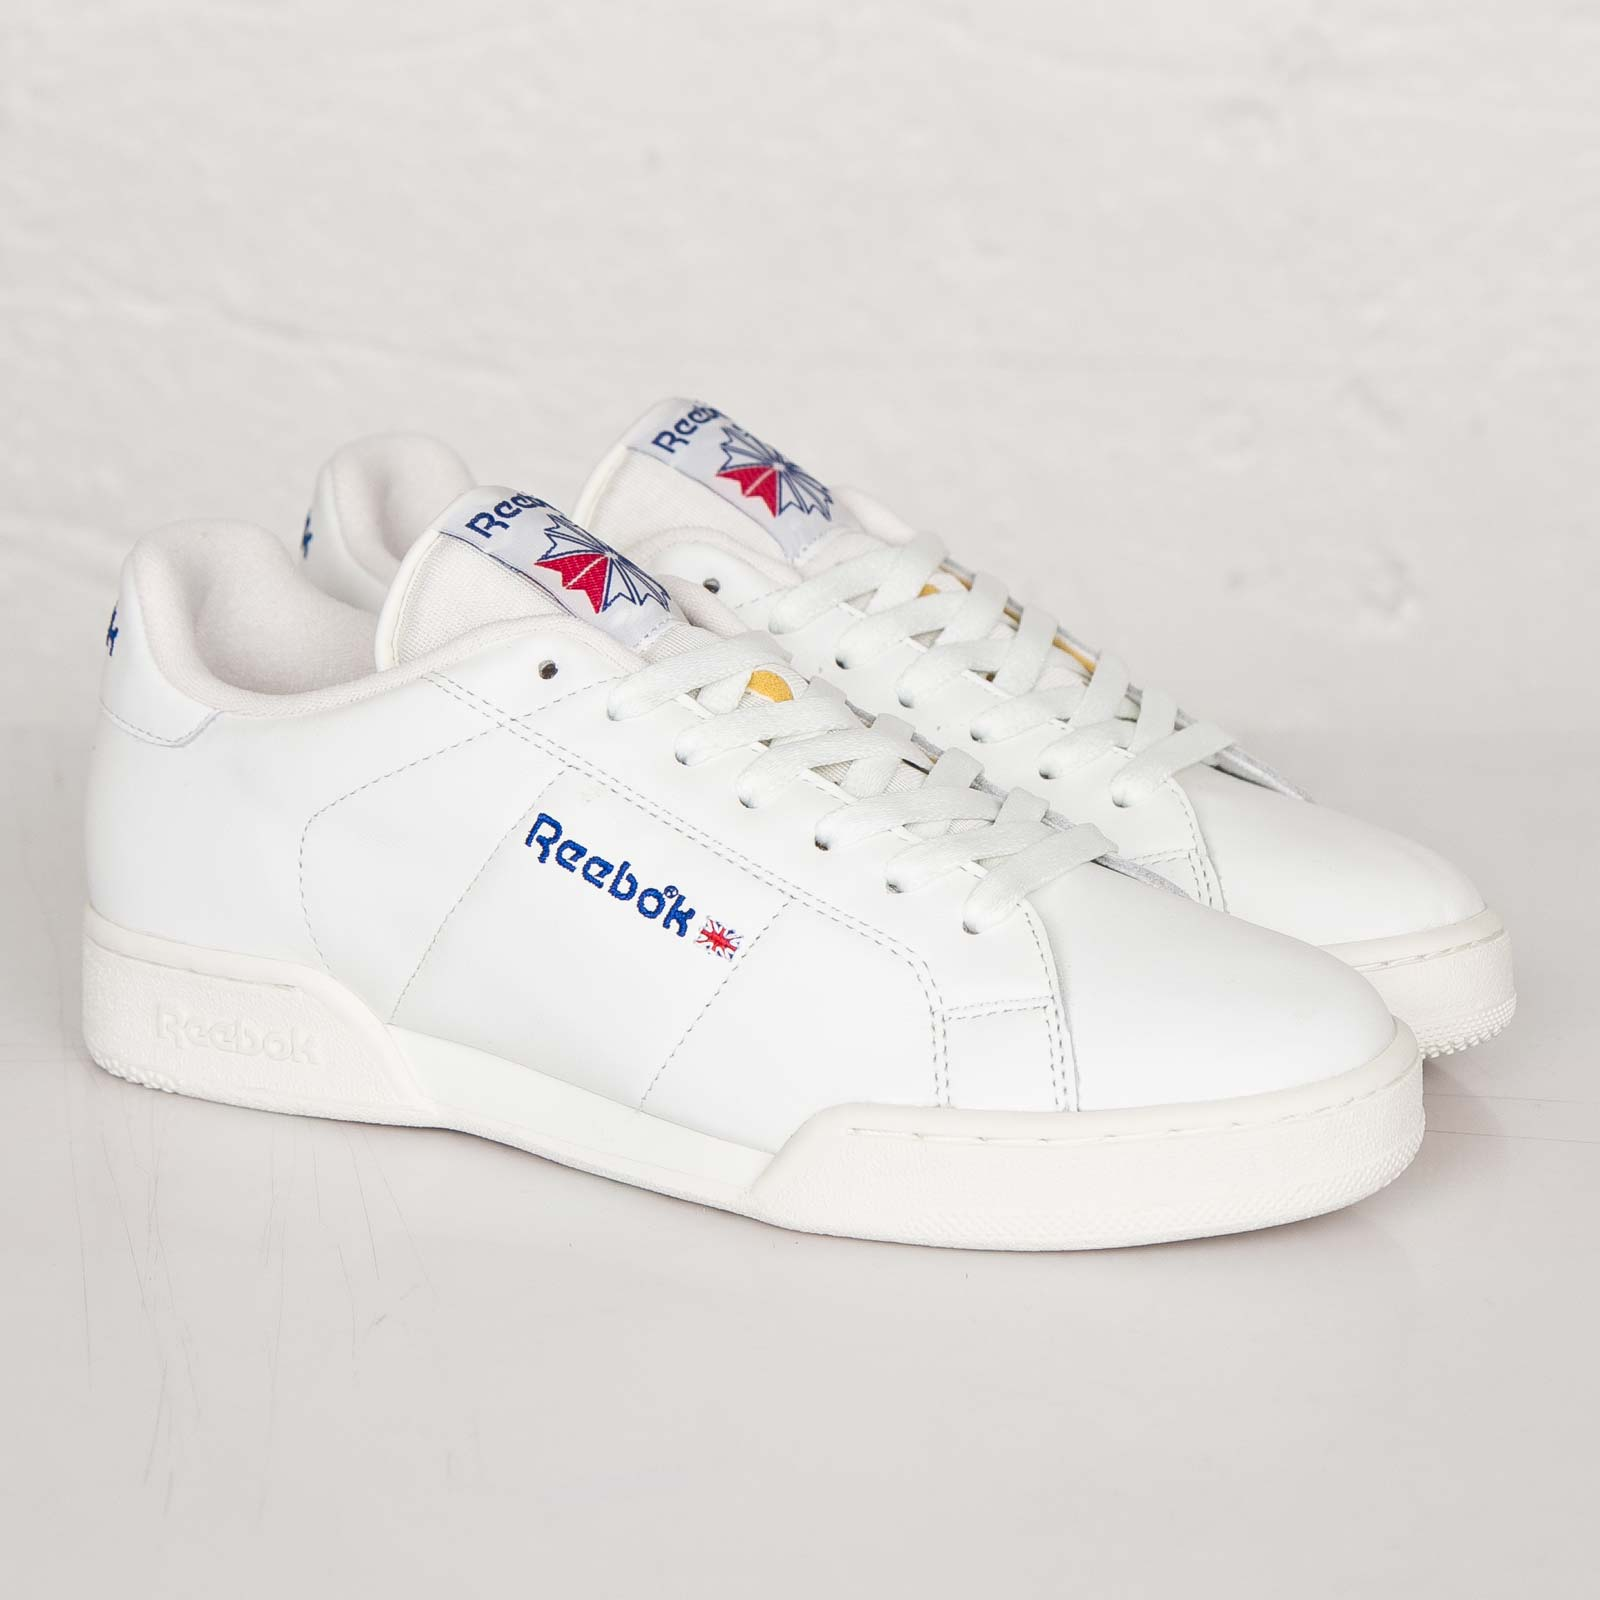 615e079d70c Reebok NPC Vintage - M46567 - Sneakersnstuff